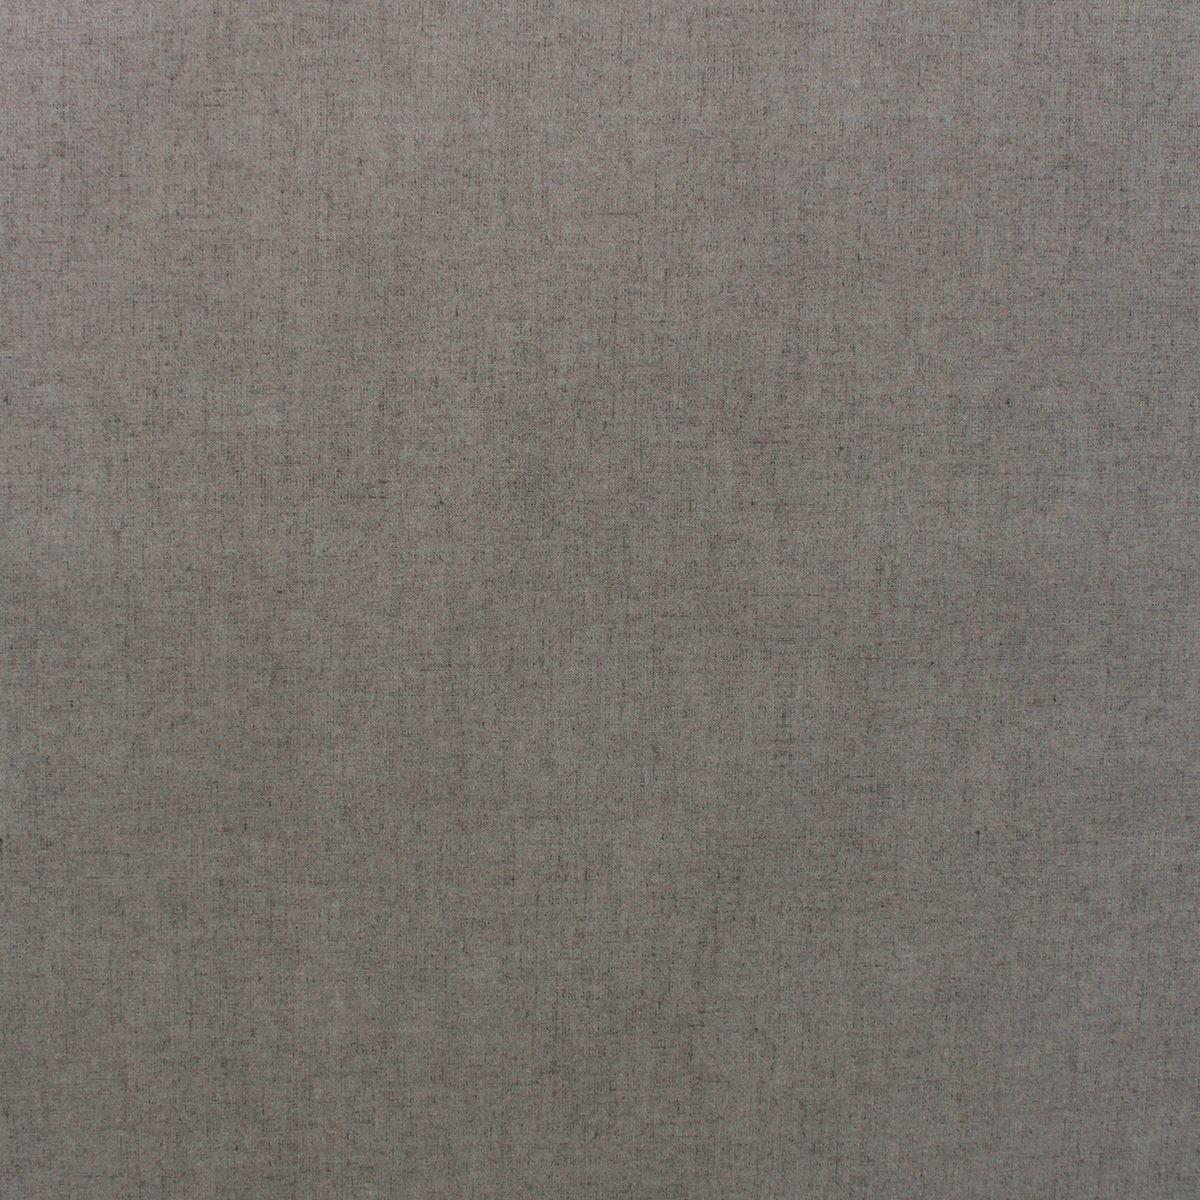 Natural Plain Fleck Soft Velvet Plush Matte Curtain Cushion Upholstery Fabric